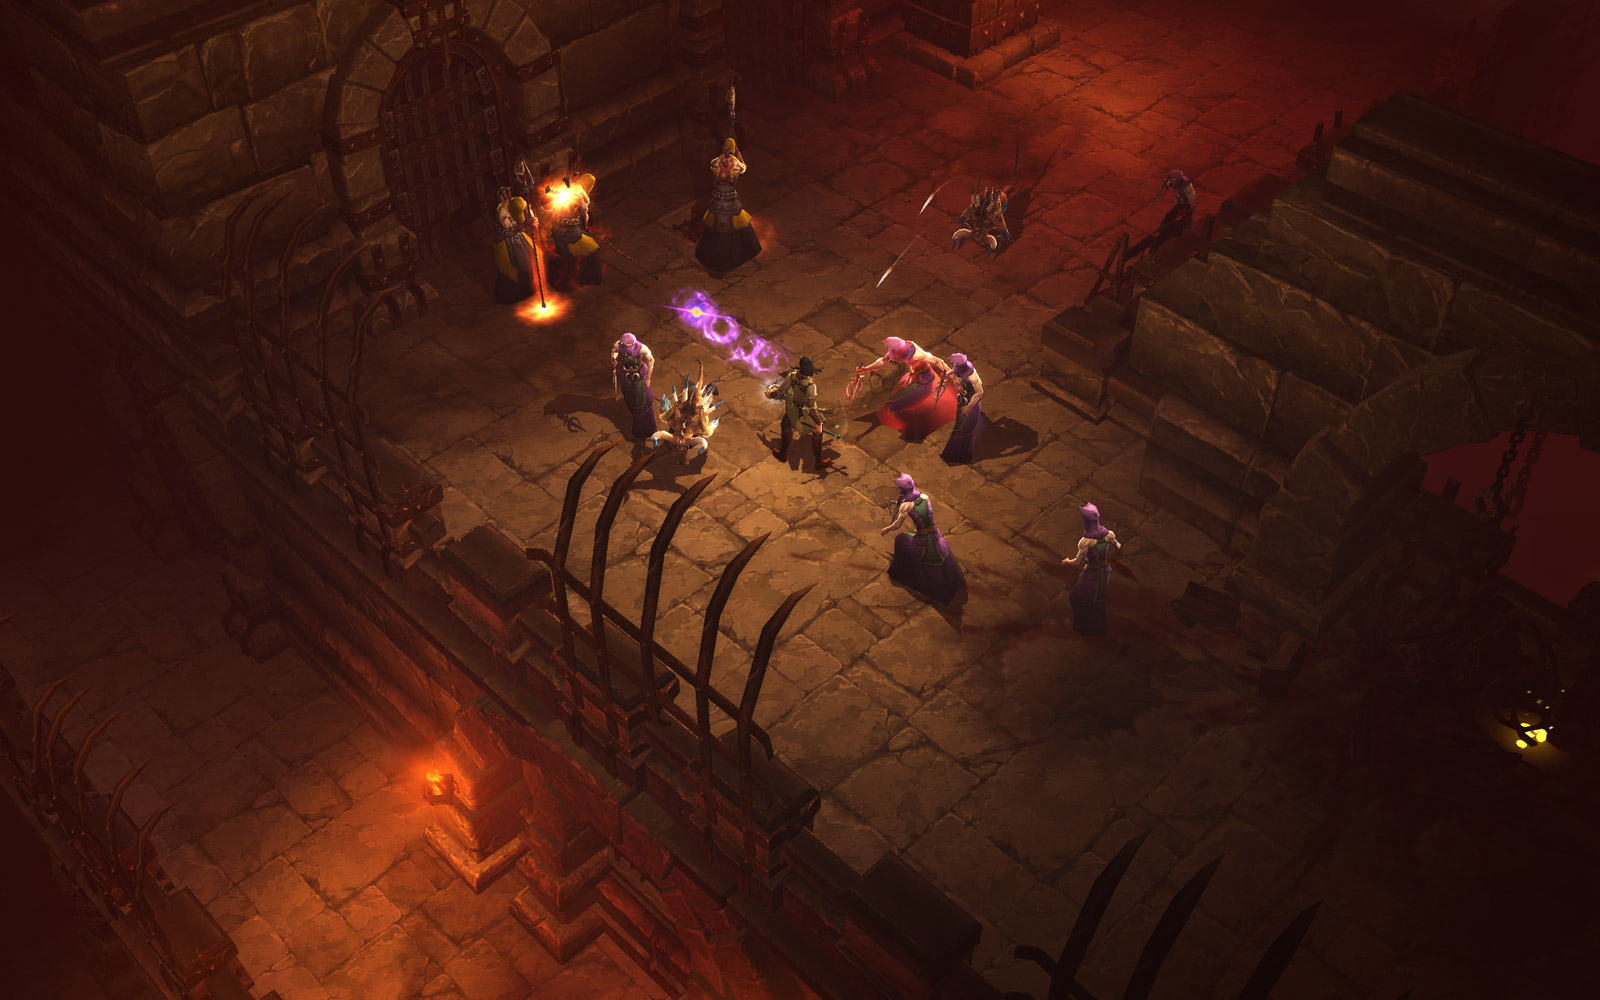 Trasnoche a la espera de Diablo III [Pase por acá] #DiabloIII